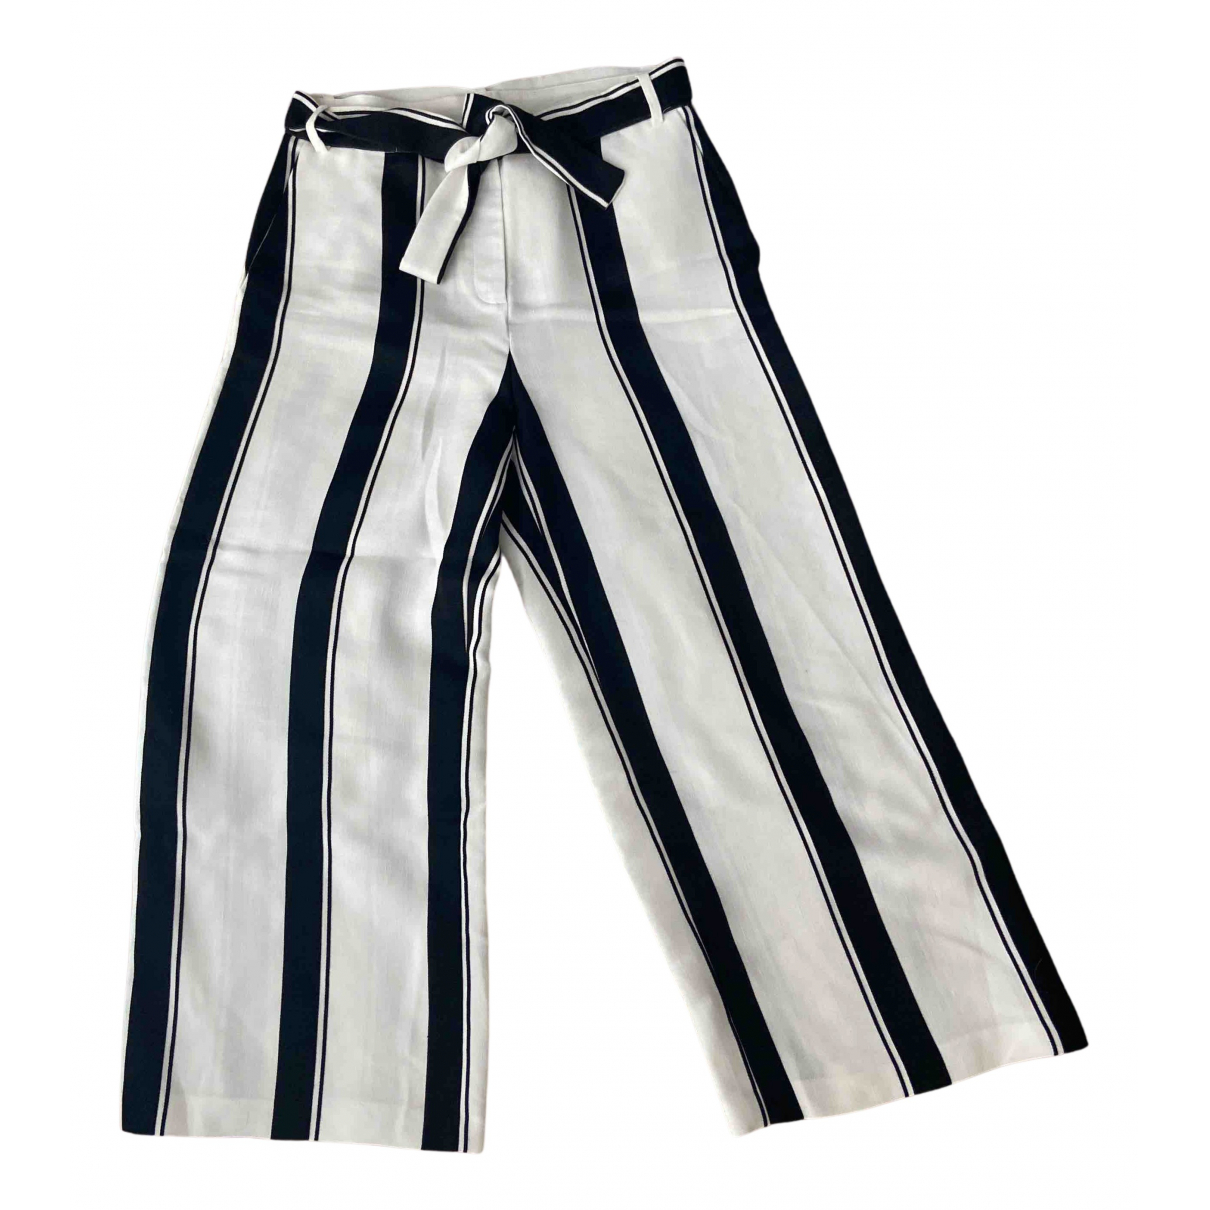 Maje Fall Winter 2019 White Linen Trousers for Women 40 FR